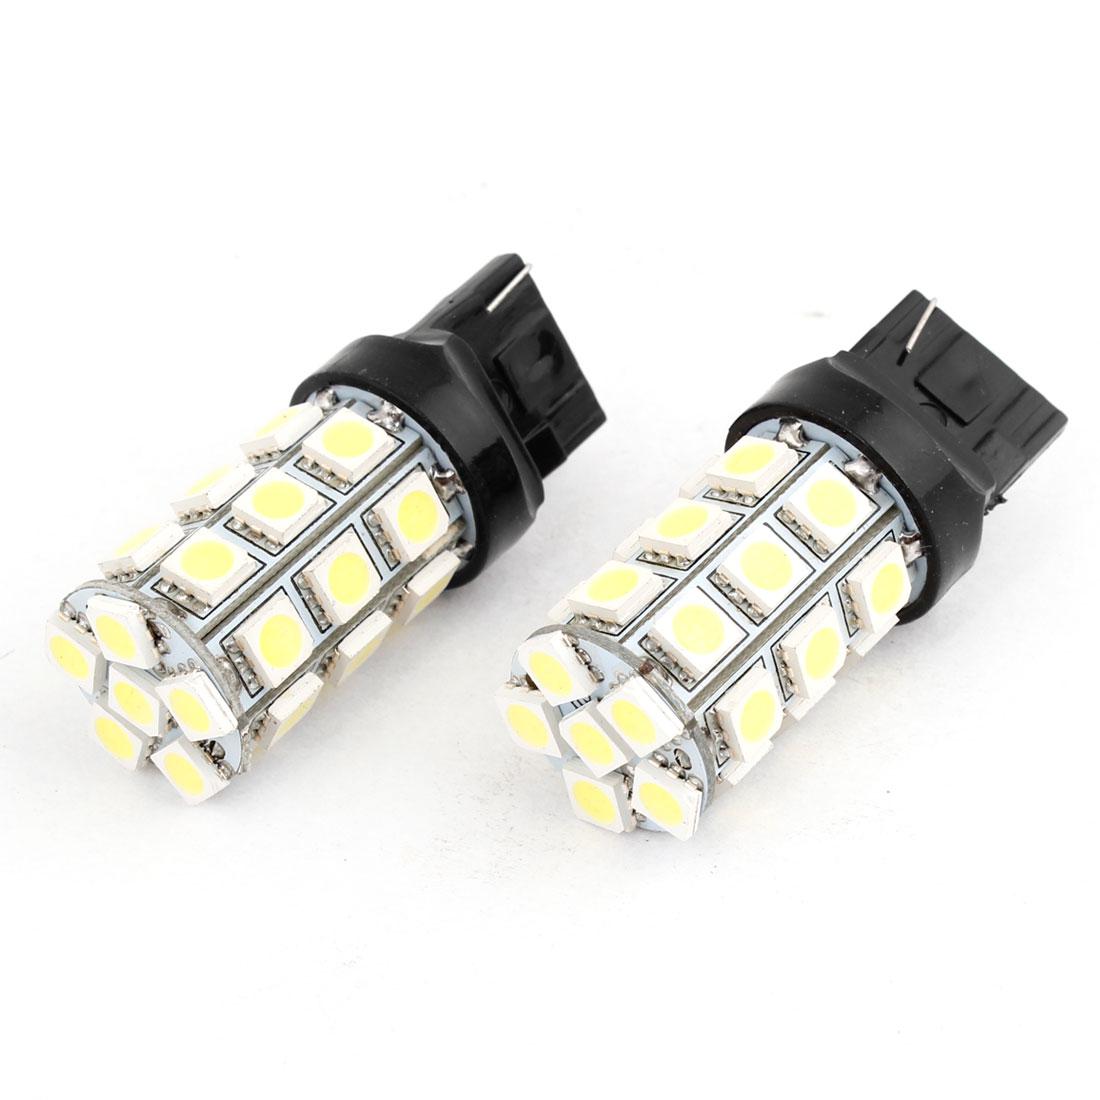 2 Pcs White 7440 27 5050 SMD LED Fog Turn Signal Lamp DC 12V for Vehicle Car